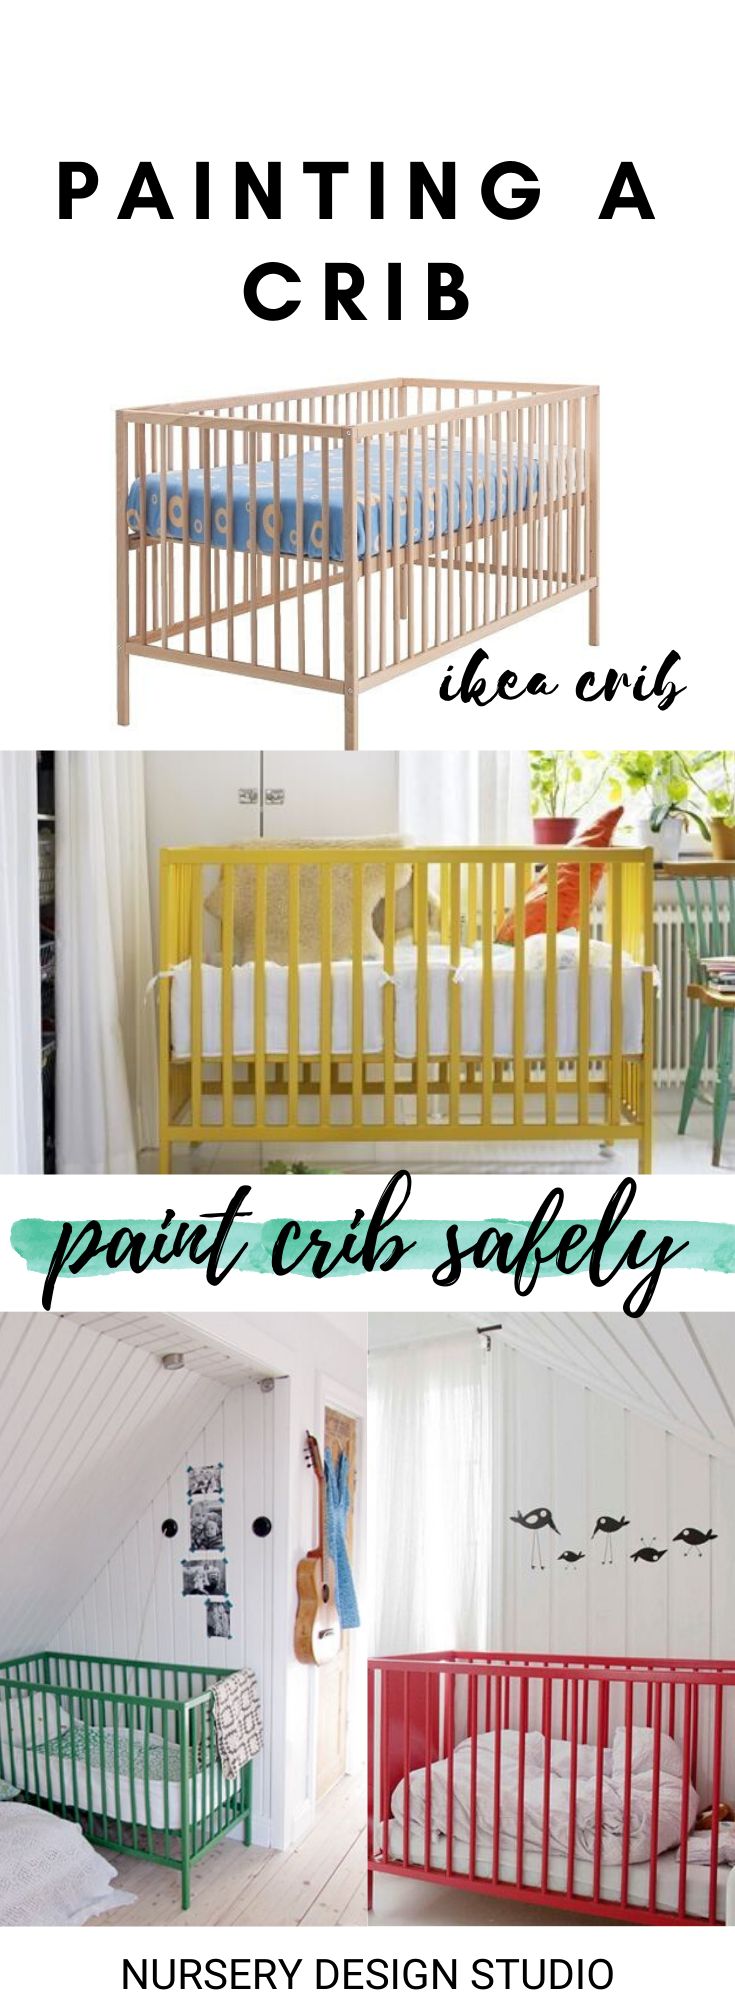 How To Paint A Crib Nursery Design Studio